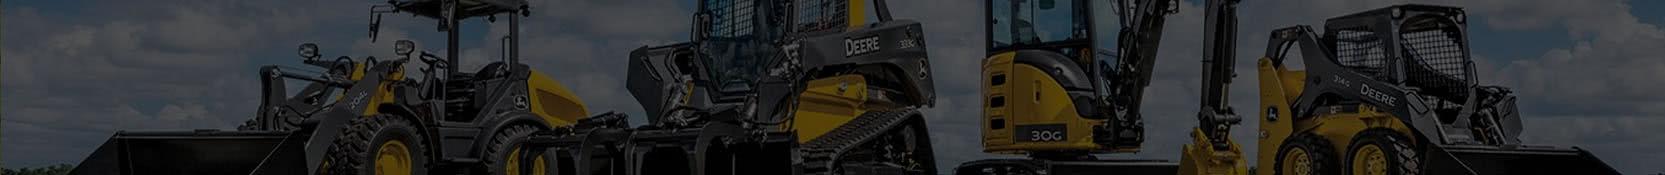 John Deere Track Loaders for Construction